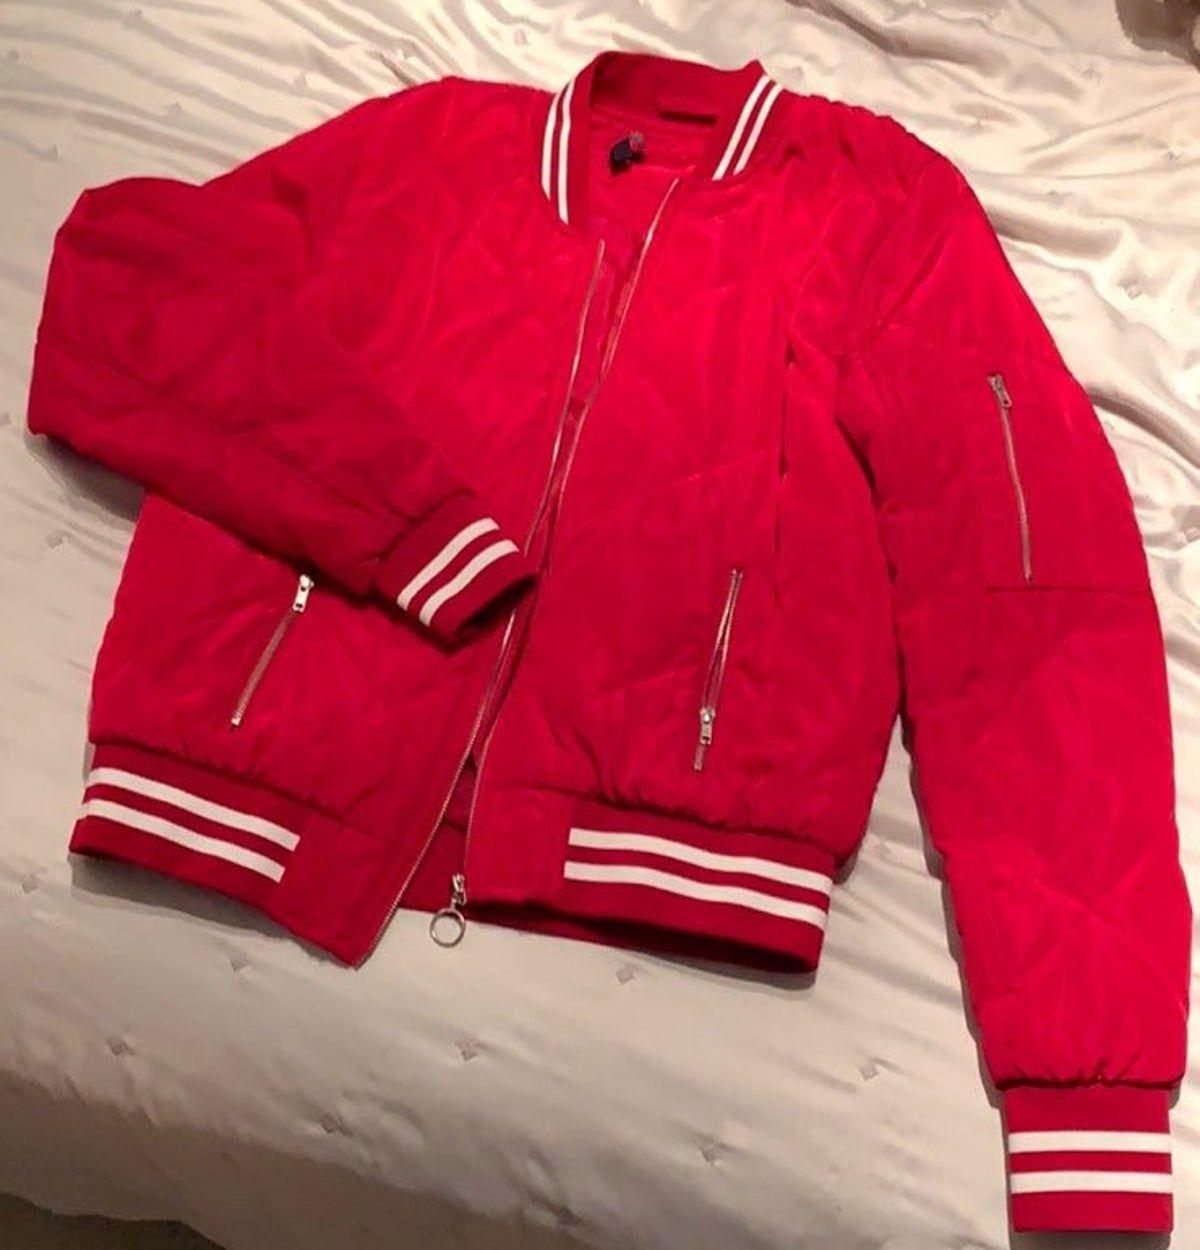 Red Bomber Jacket Red Bomber Jacket Red Bomber Jacket Outfit Bomber Jacket Outfit [ 1250 x 1200 Pixel ]